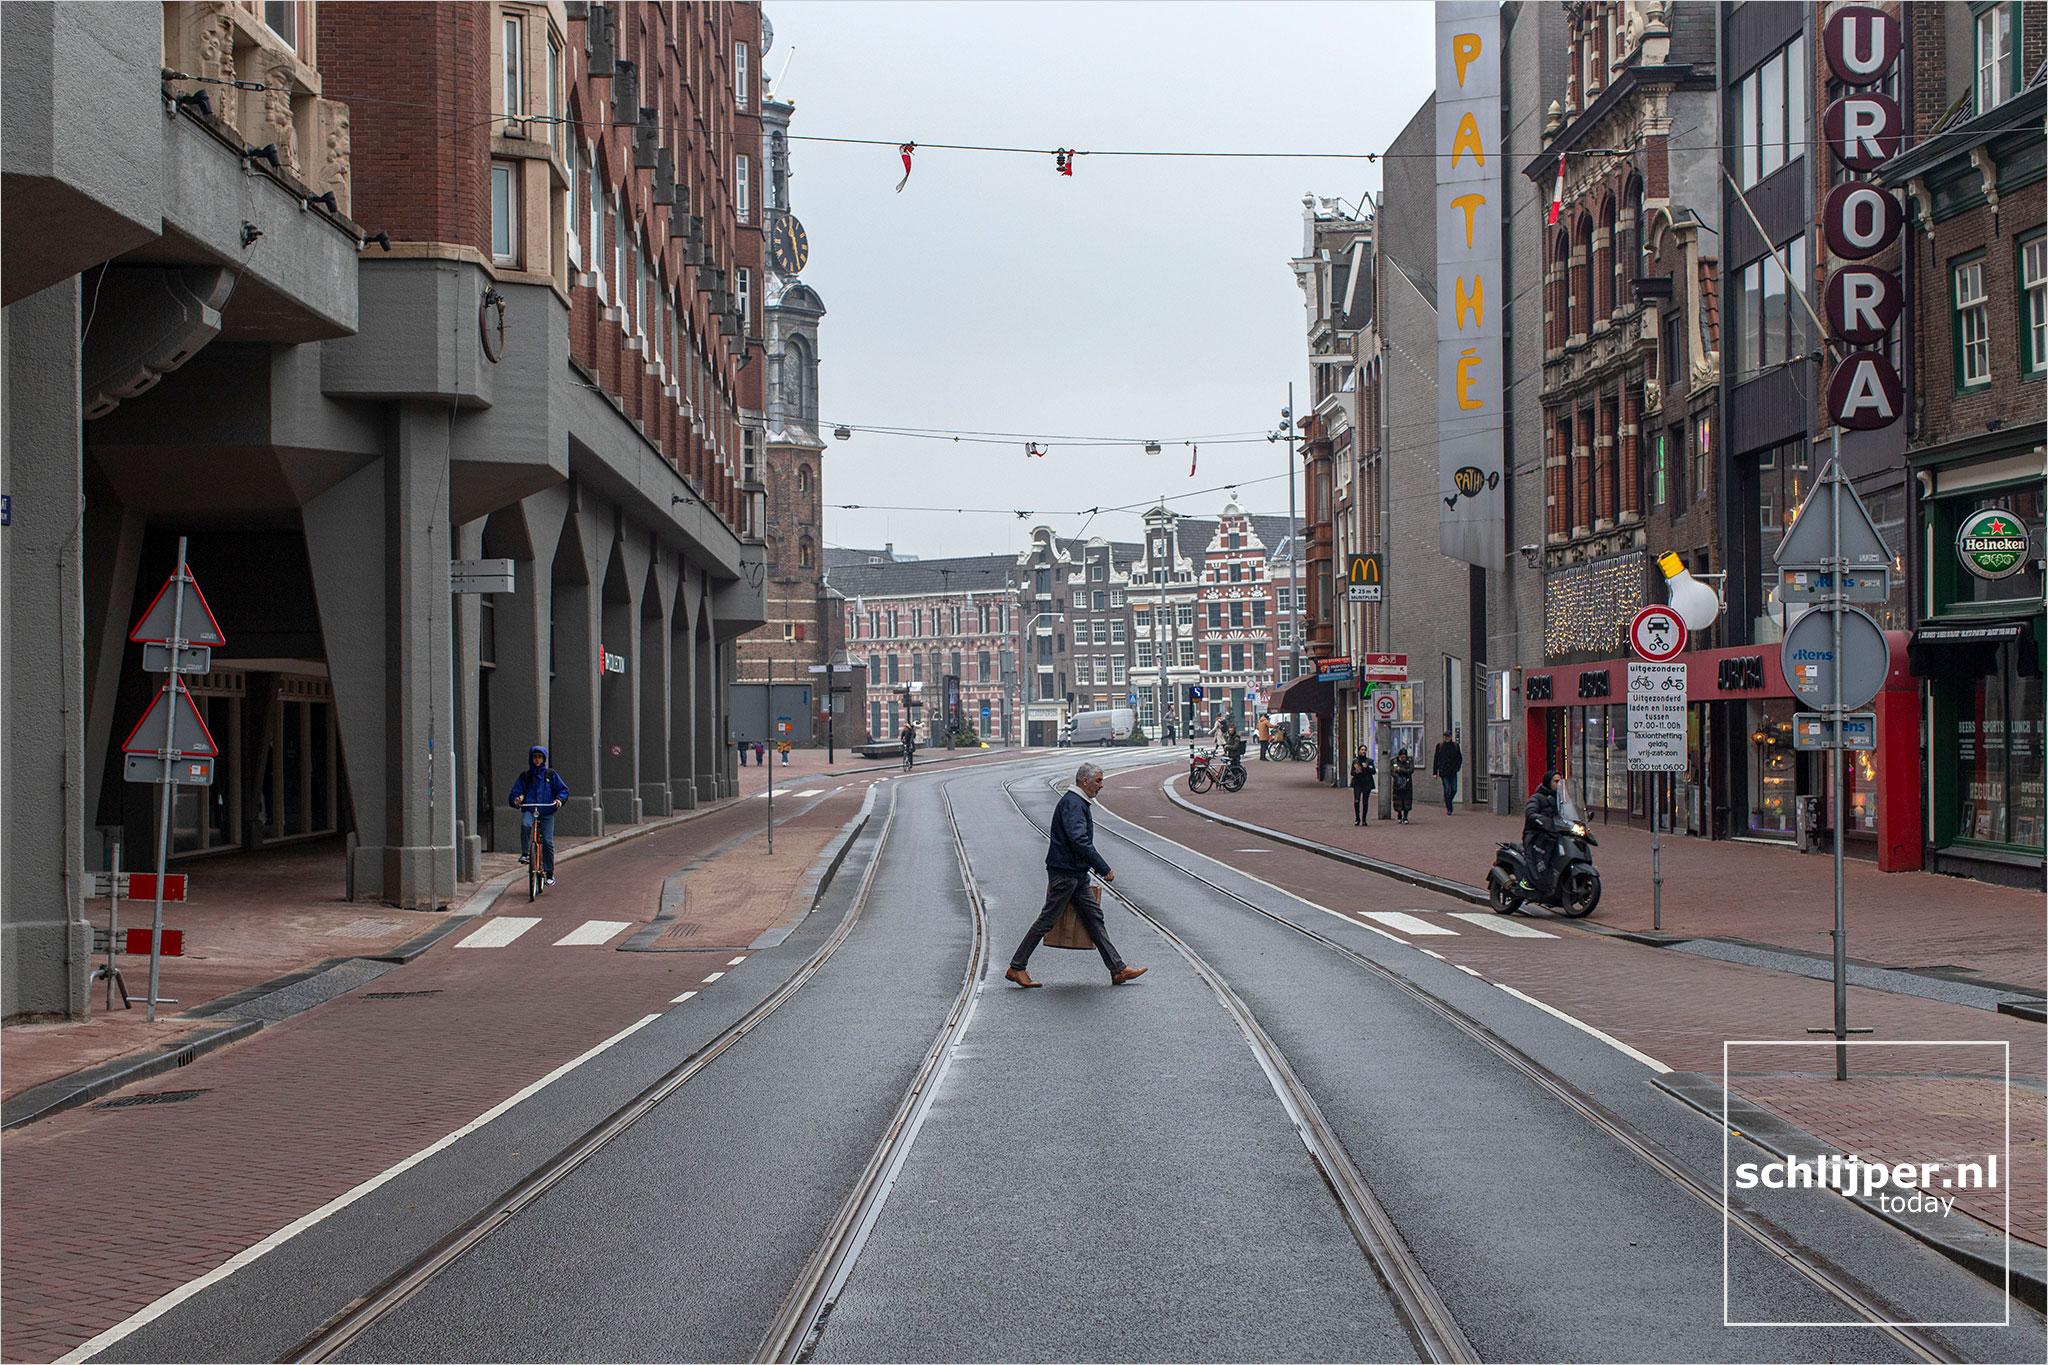 The Netherlands, Amsterdam, 25 maart 2021